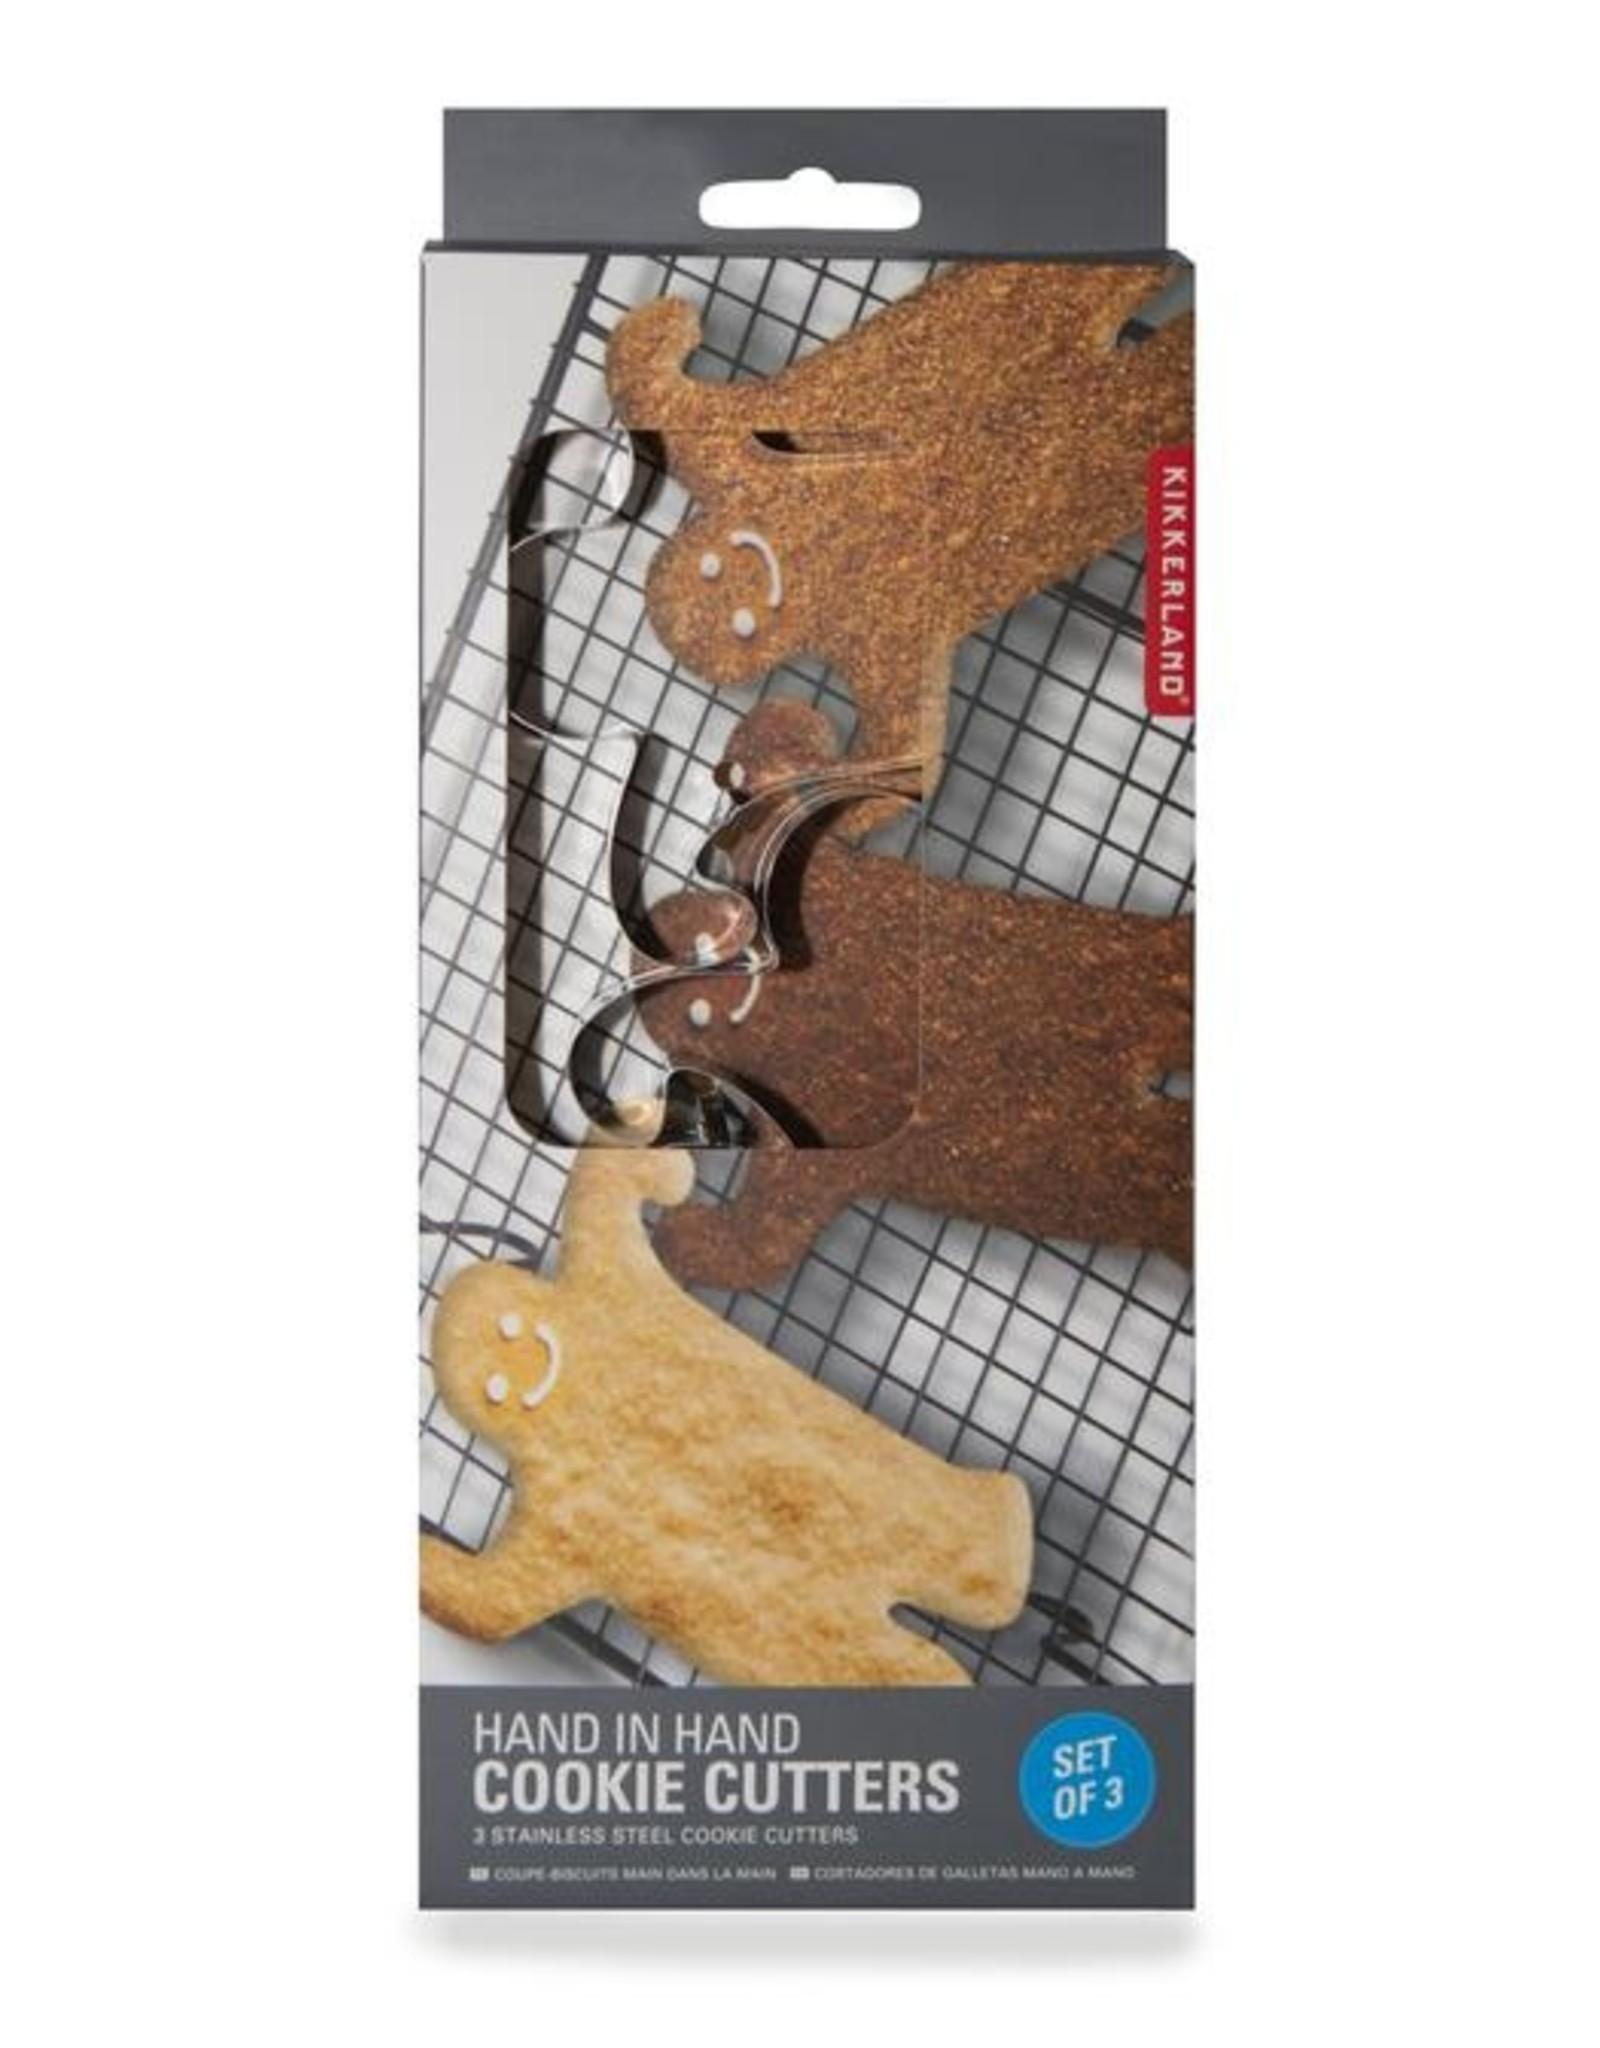 Kikkerland Hand in Hand Cookie Cutter